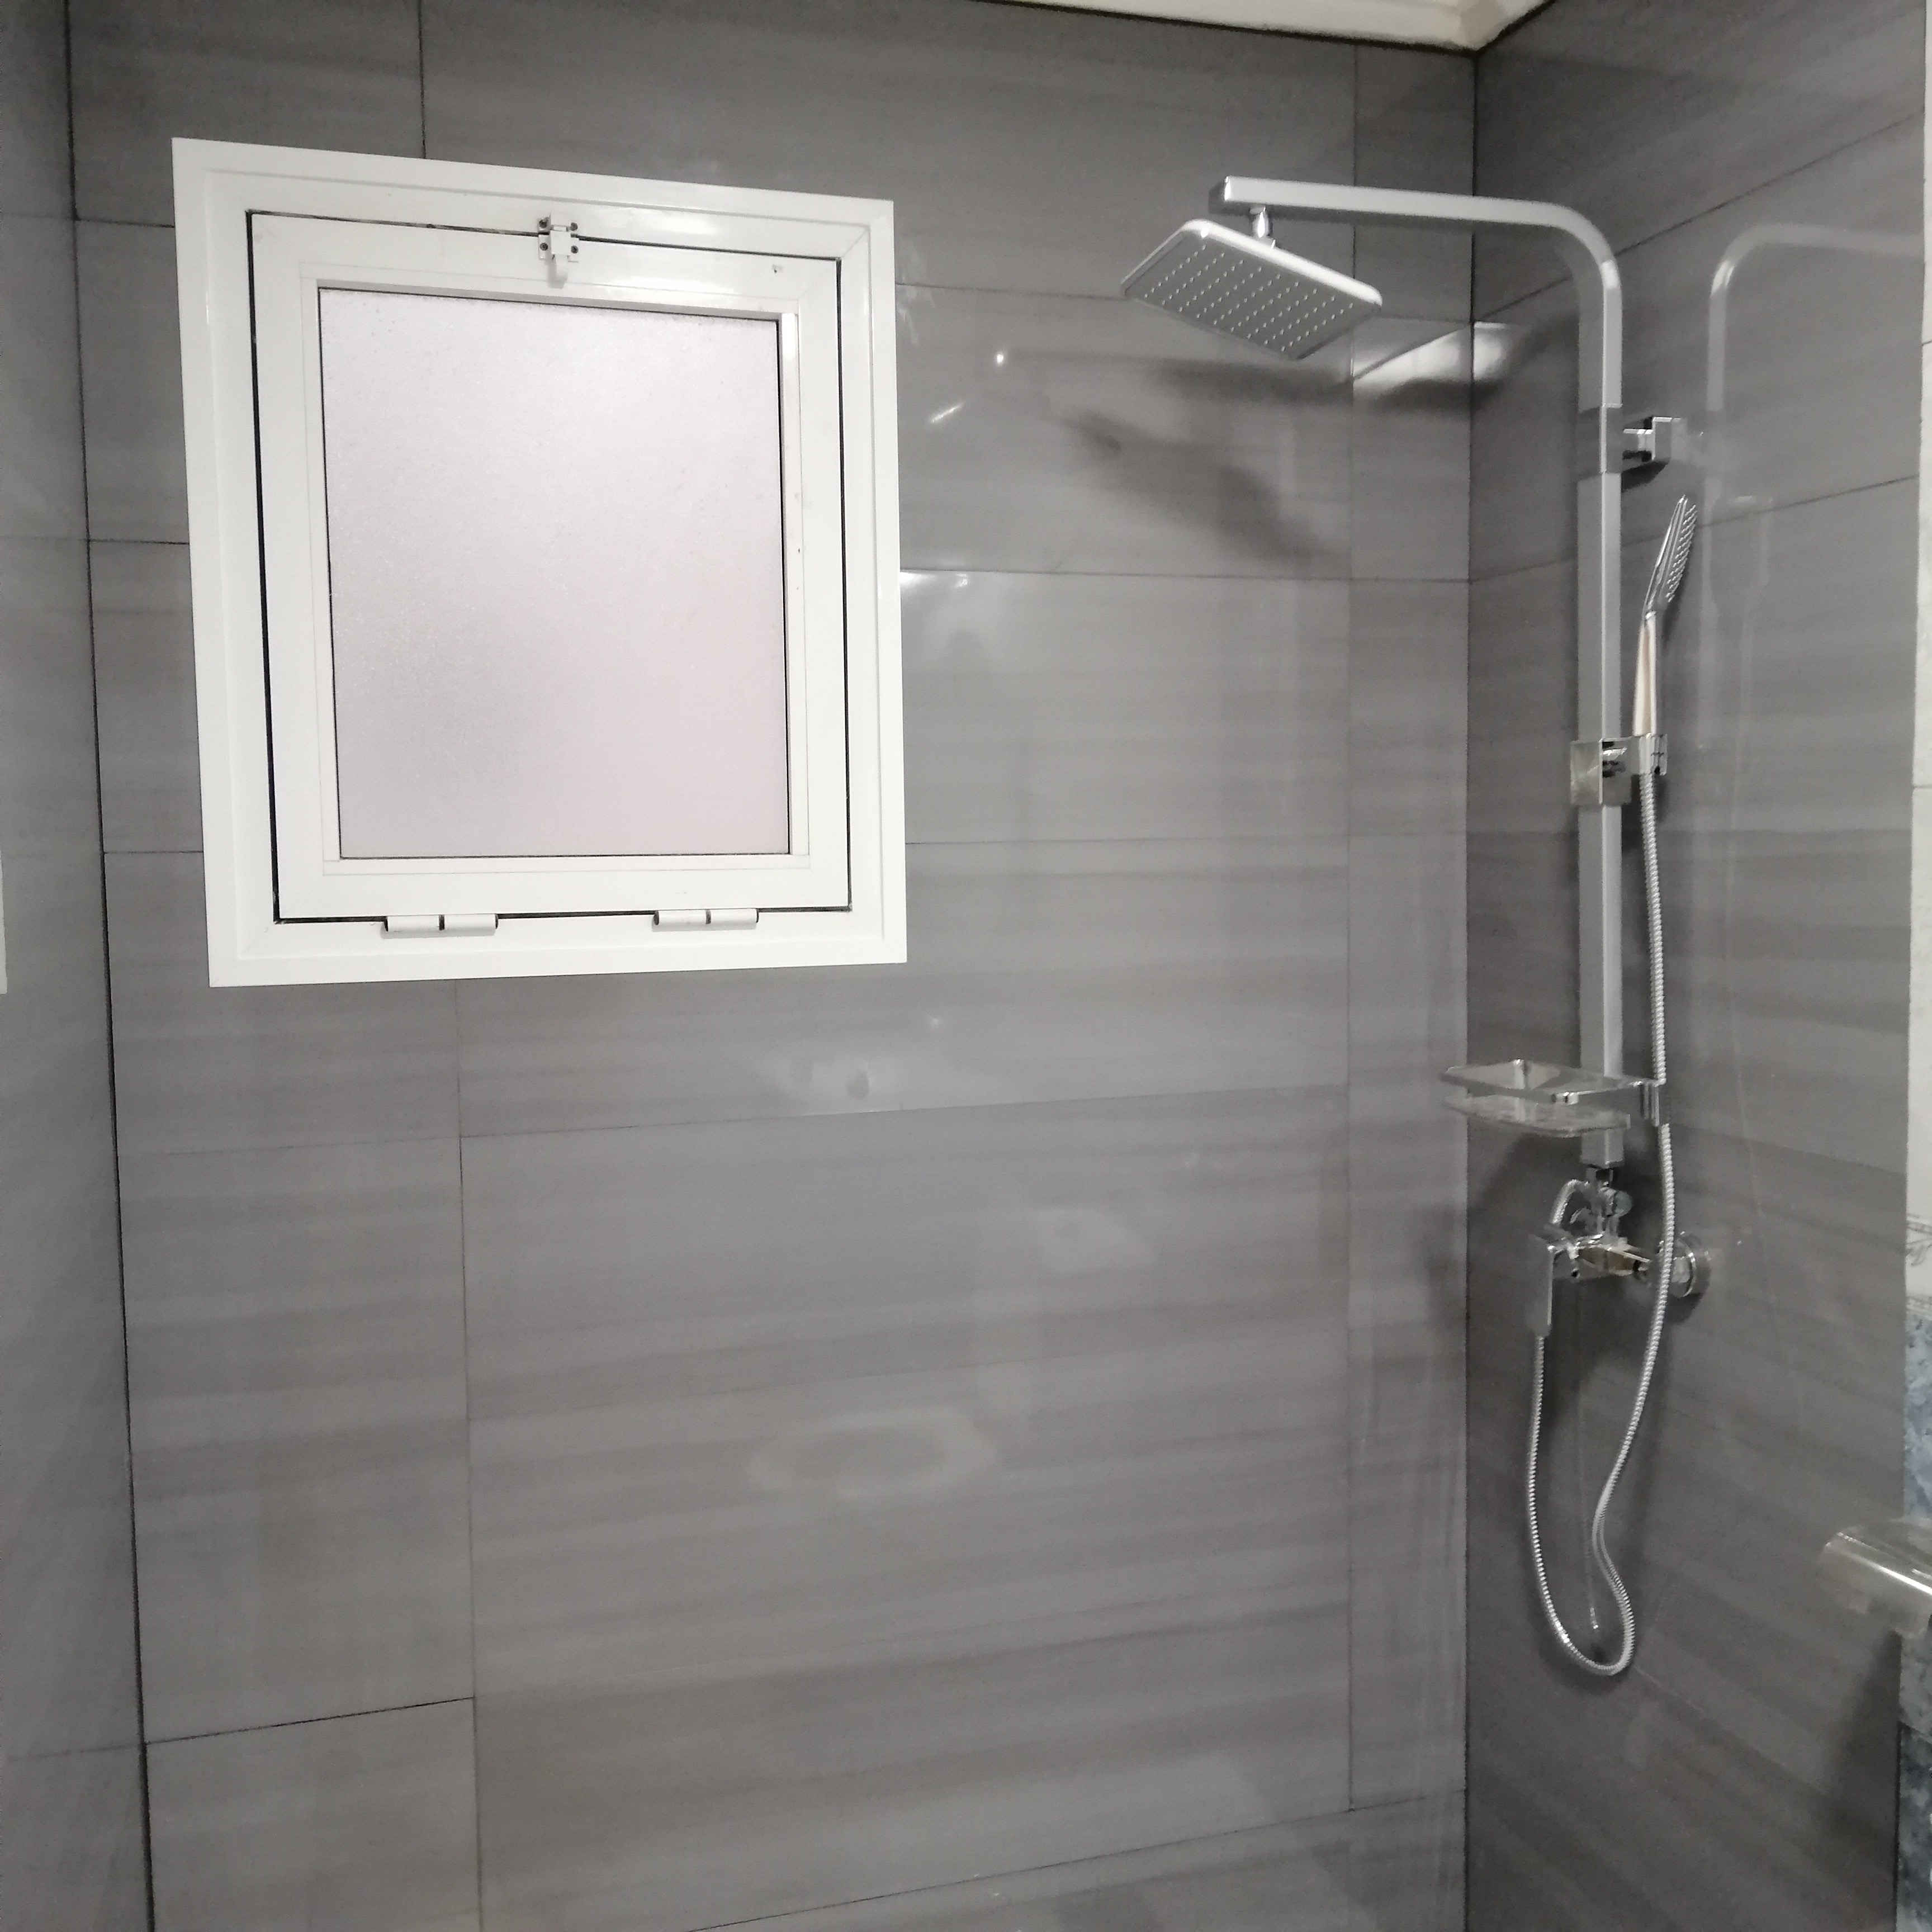 sustituir bañera por ducha torrevieja